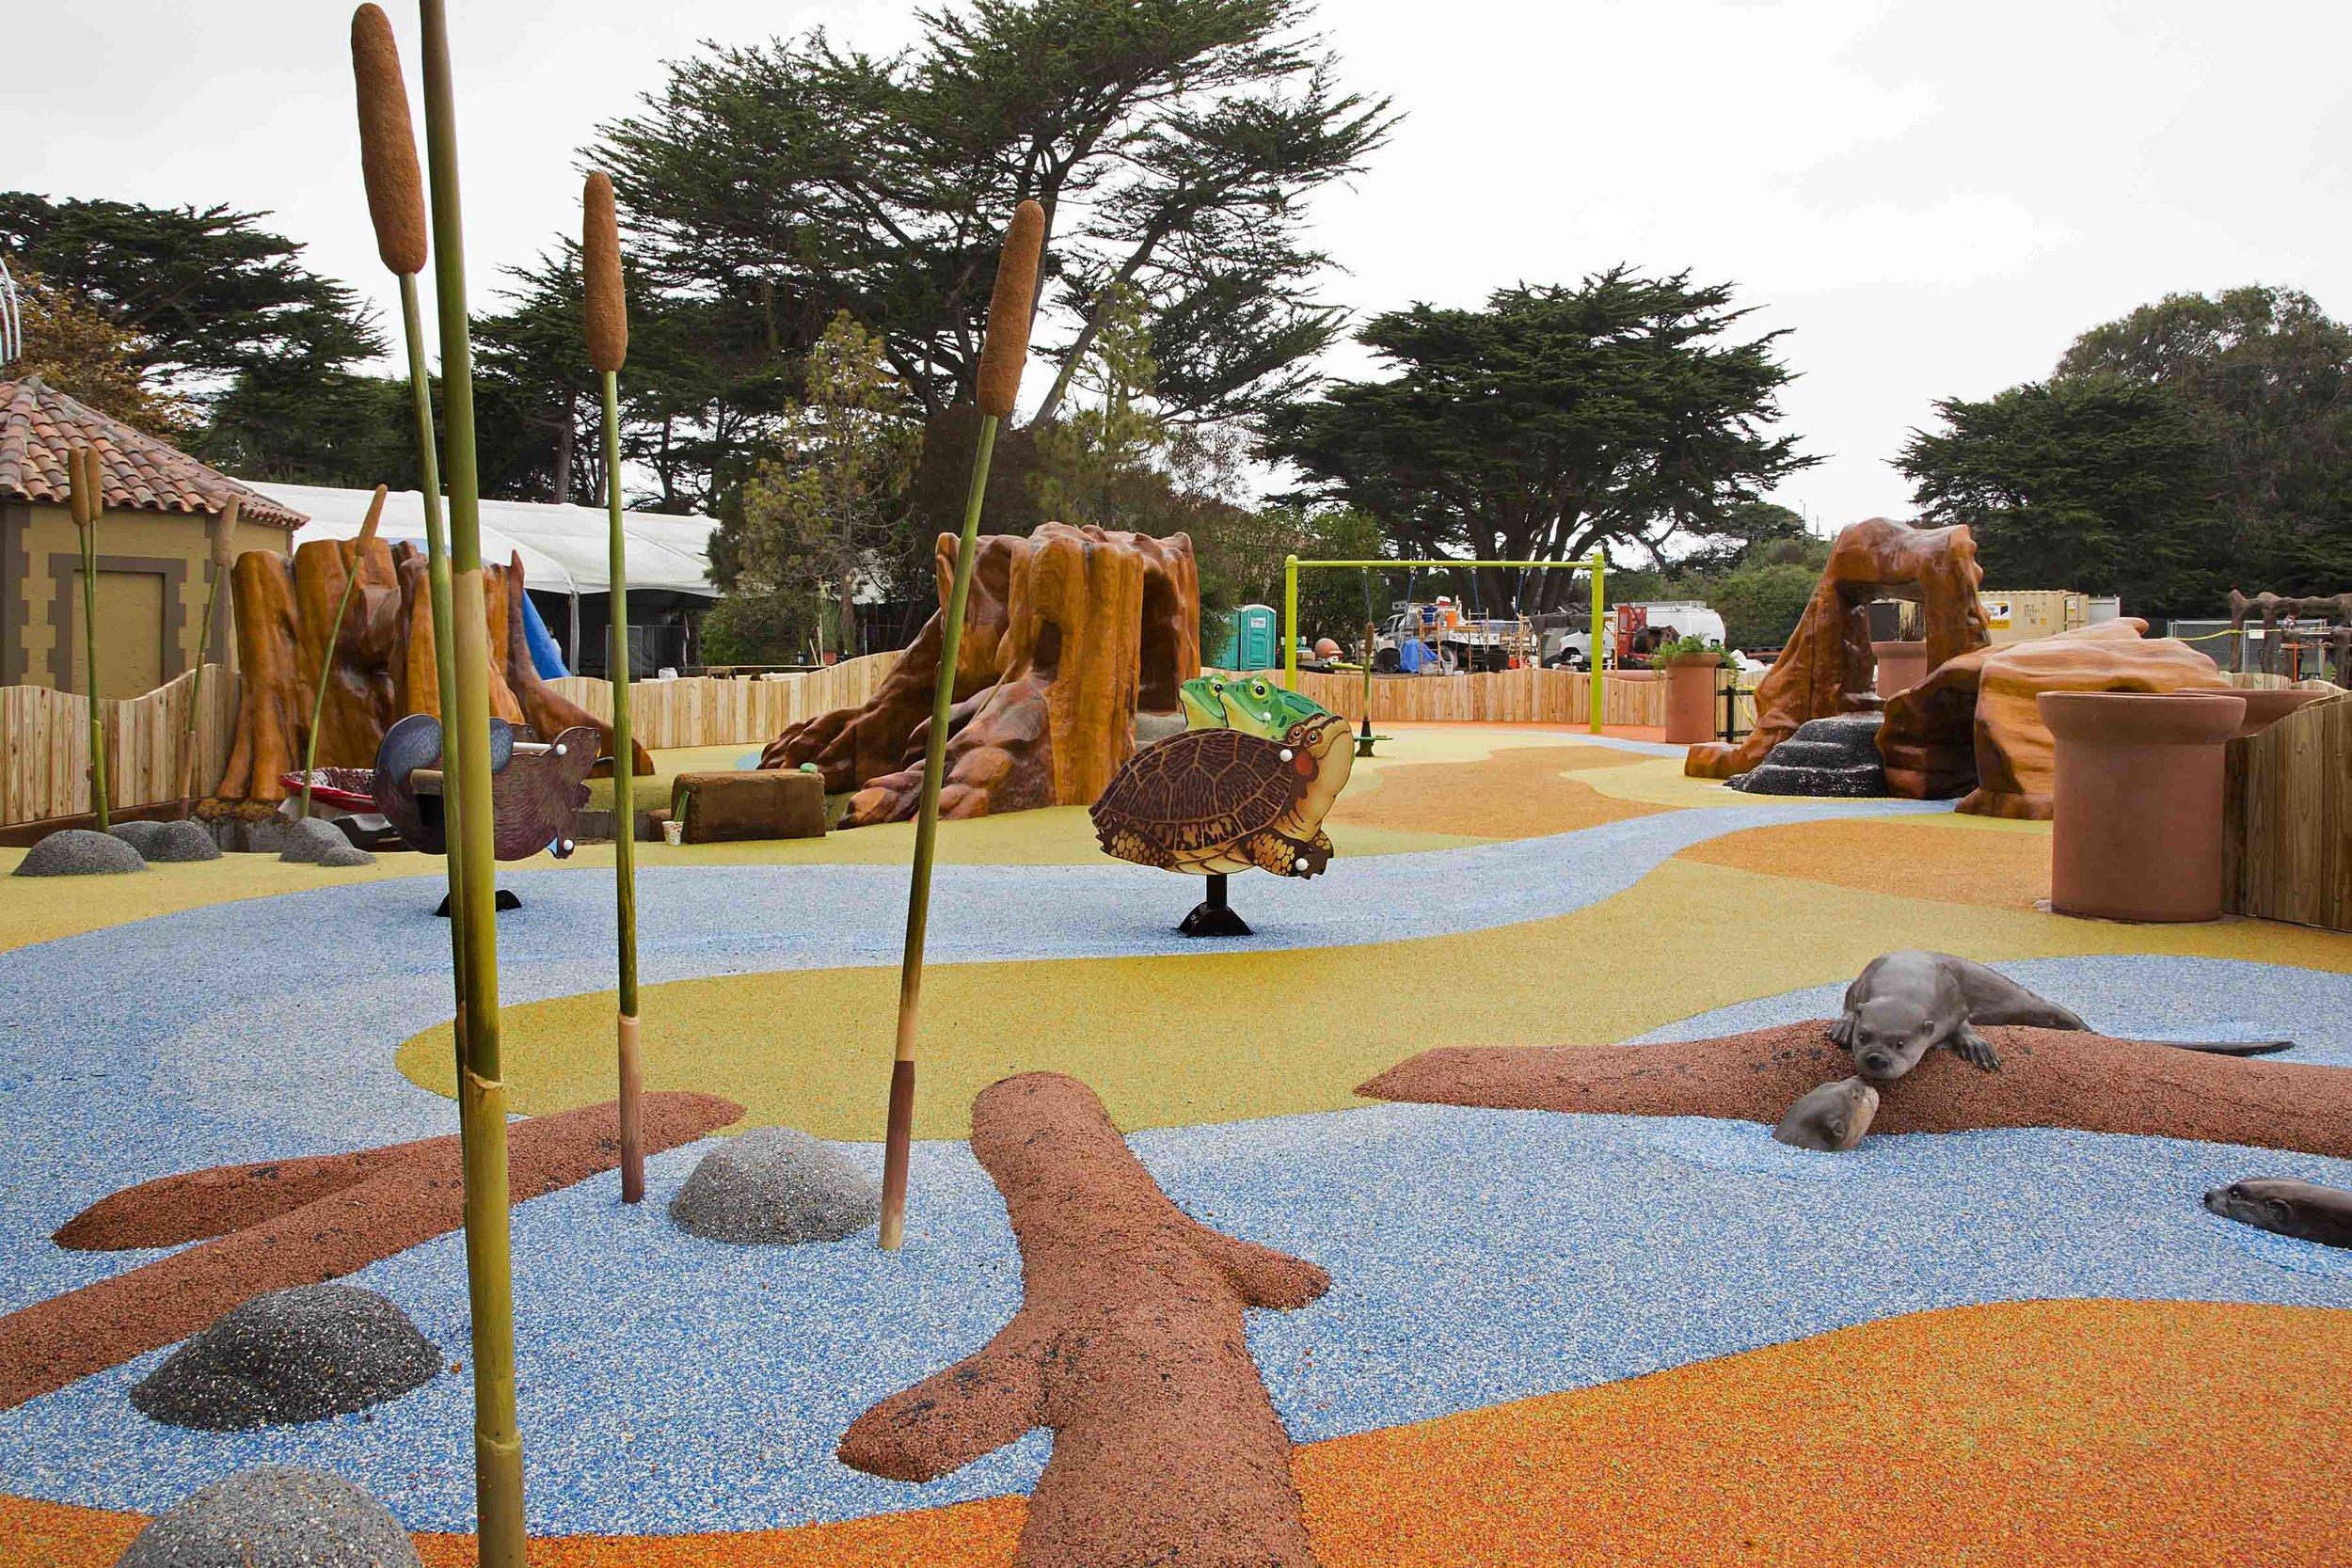 SF Zoo.Playground.Riverside.riverside wide view.lo.jpg